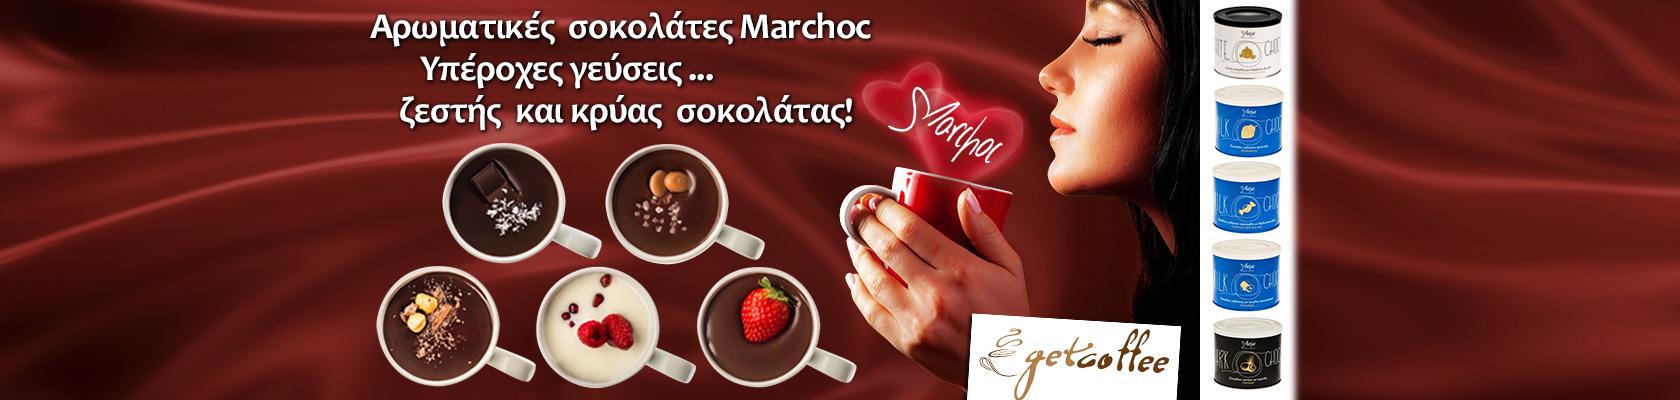 2_marchoc-getcoffee-1680×400